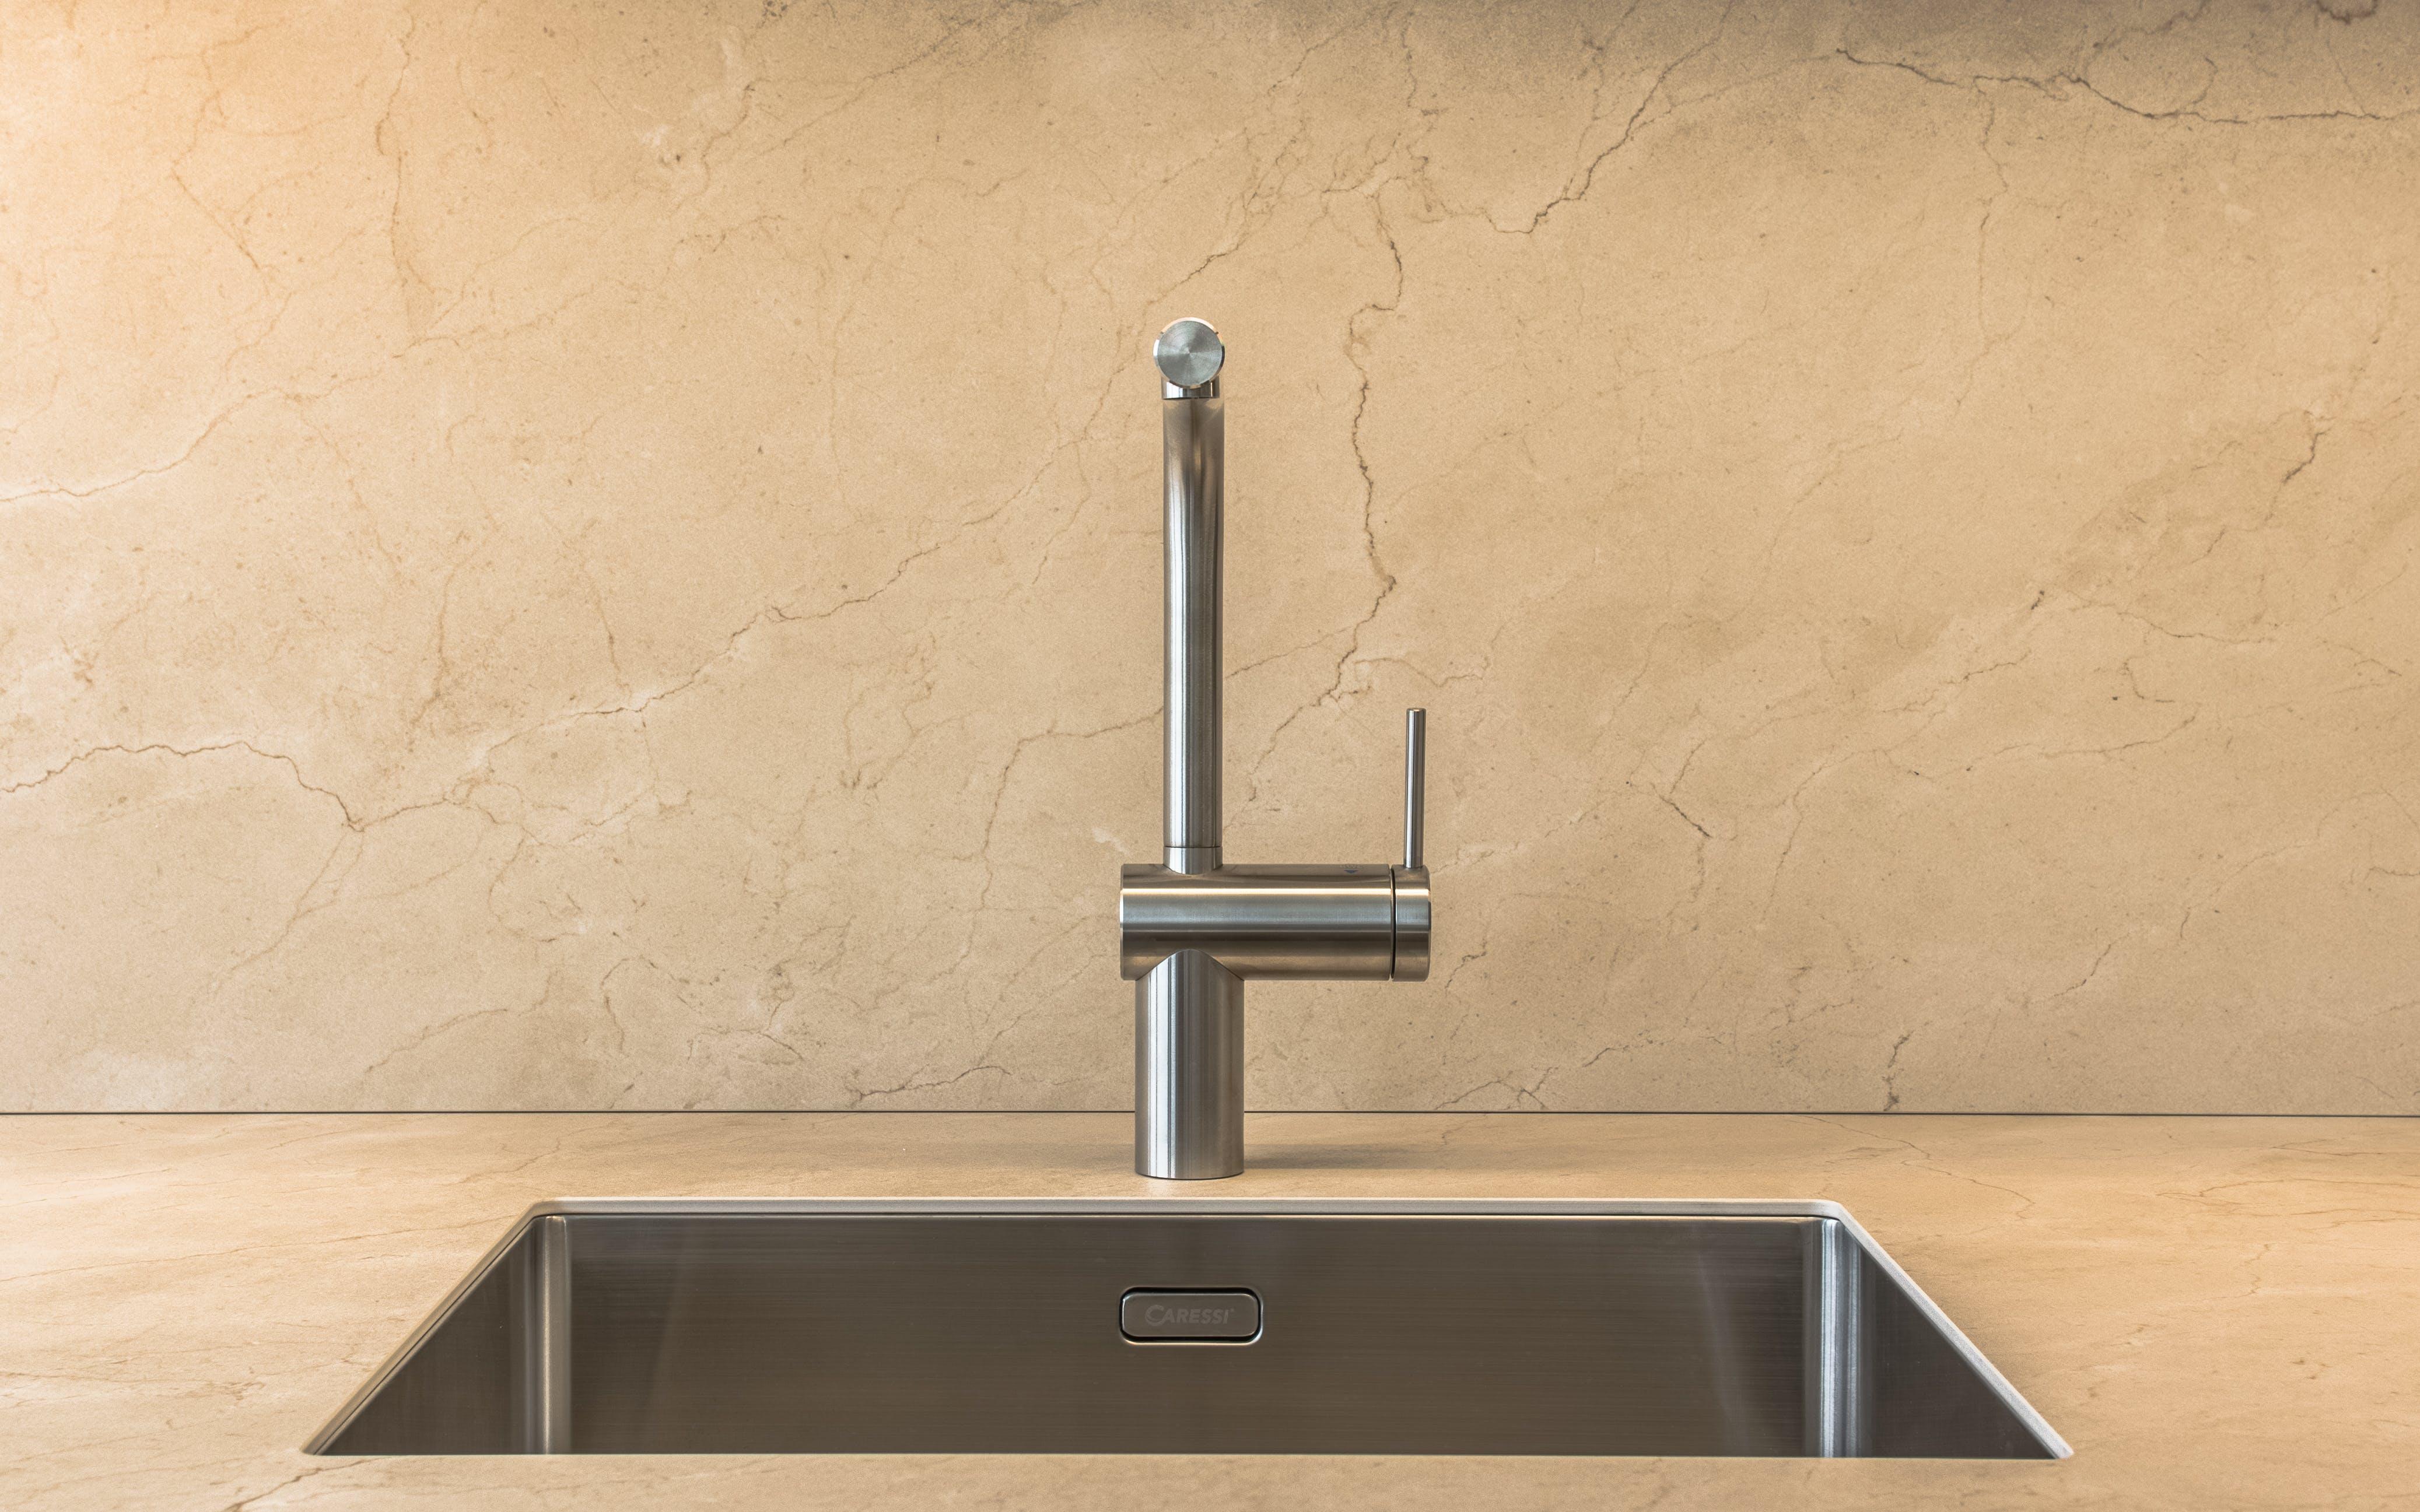 Free stock photo of ceramics, kitchen sink